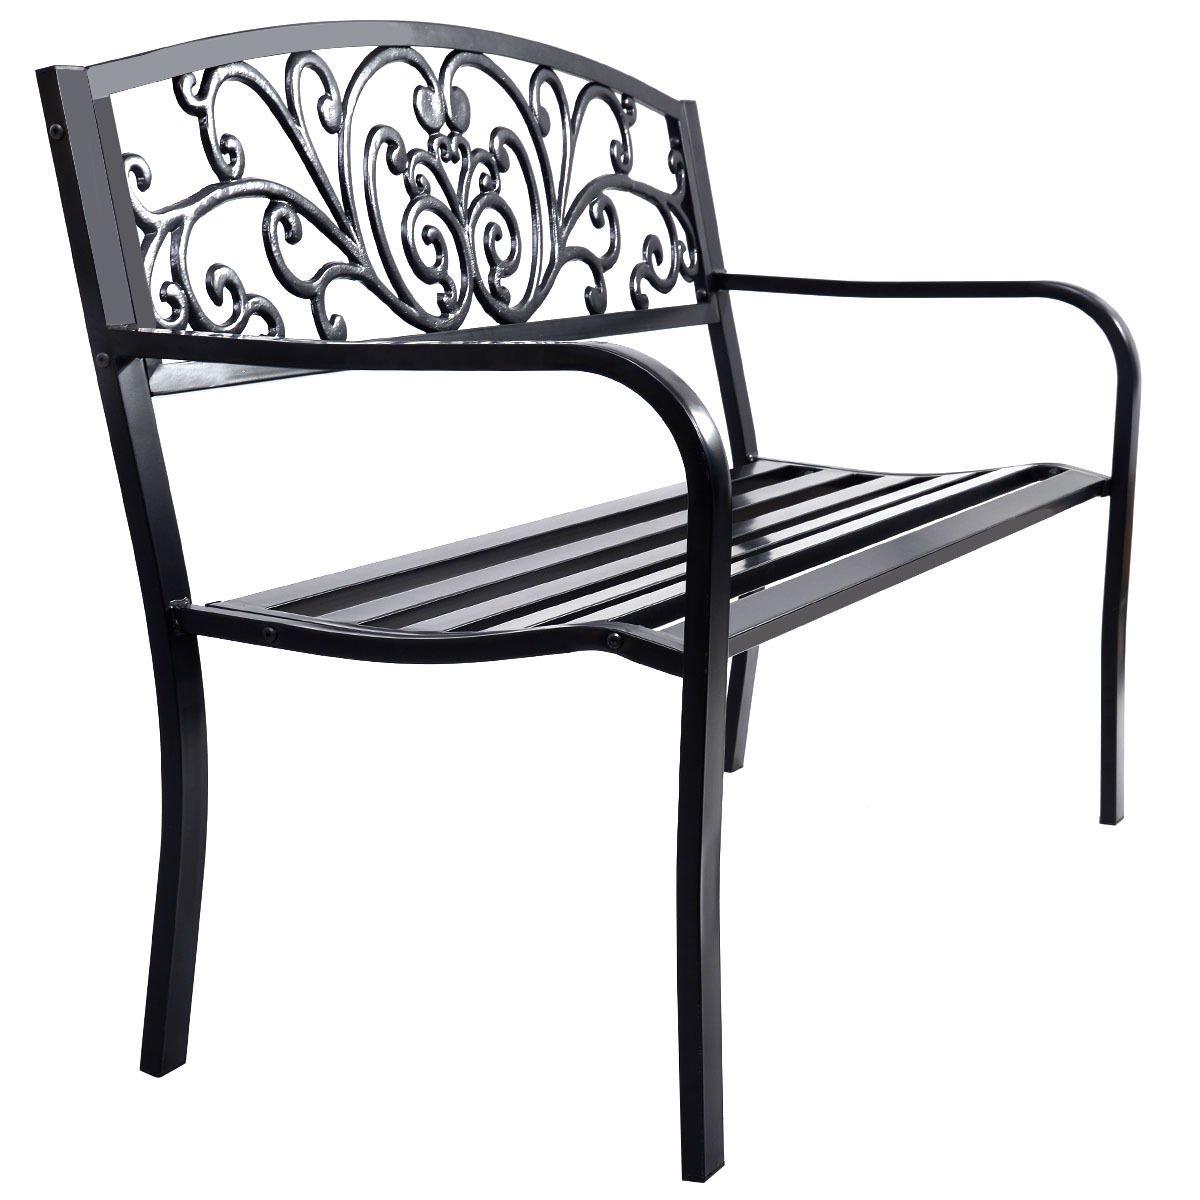 Giantex 50'' Patio Park Garden Bench Porch Chair Steel Frame Cast Iron Backrest